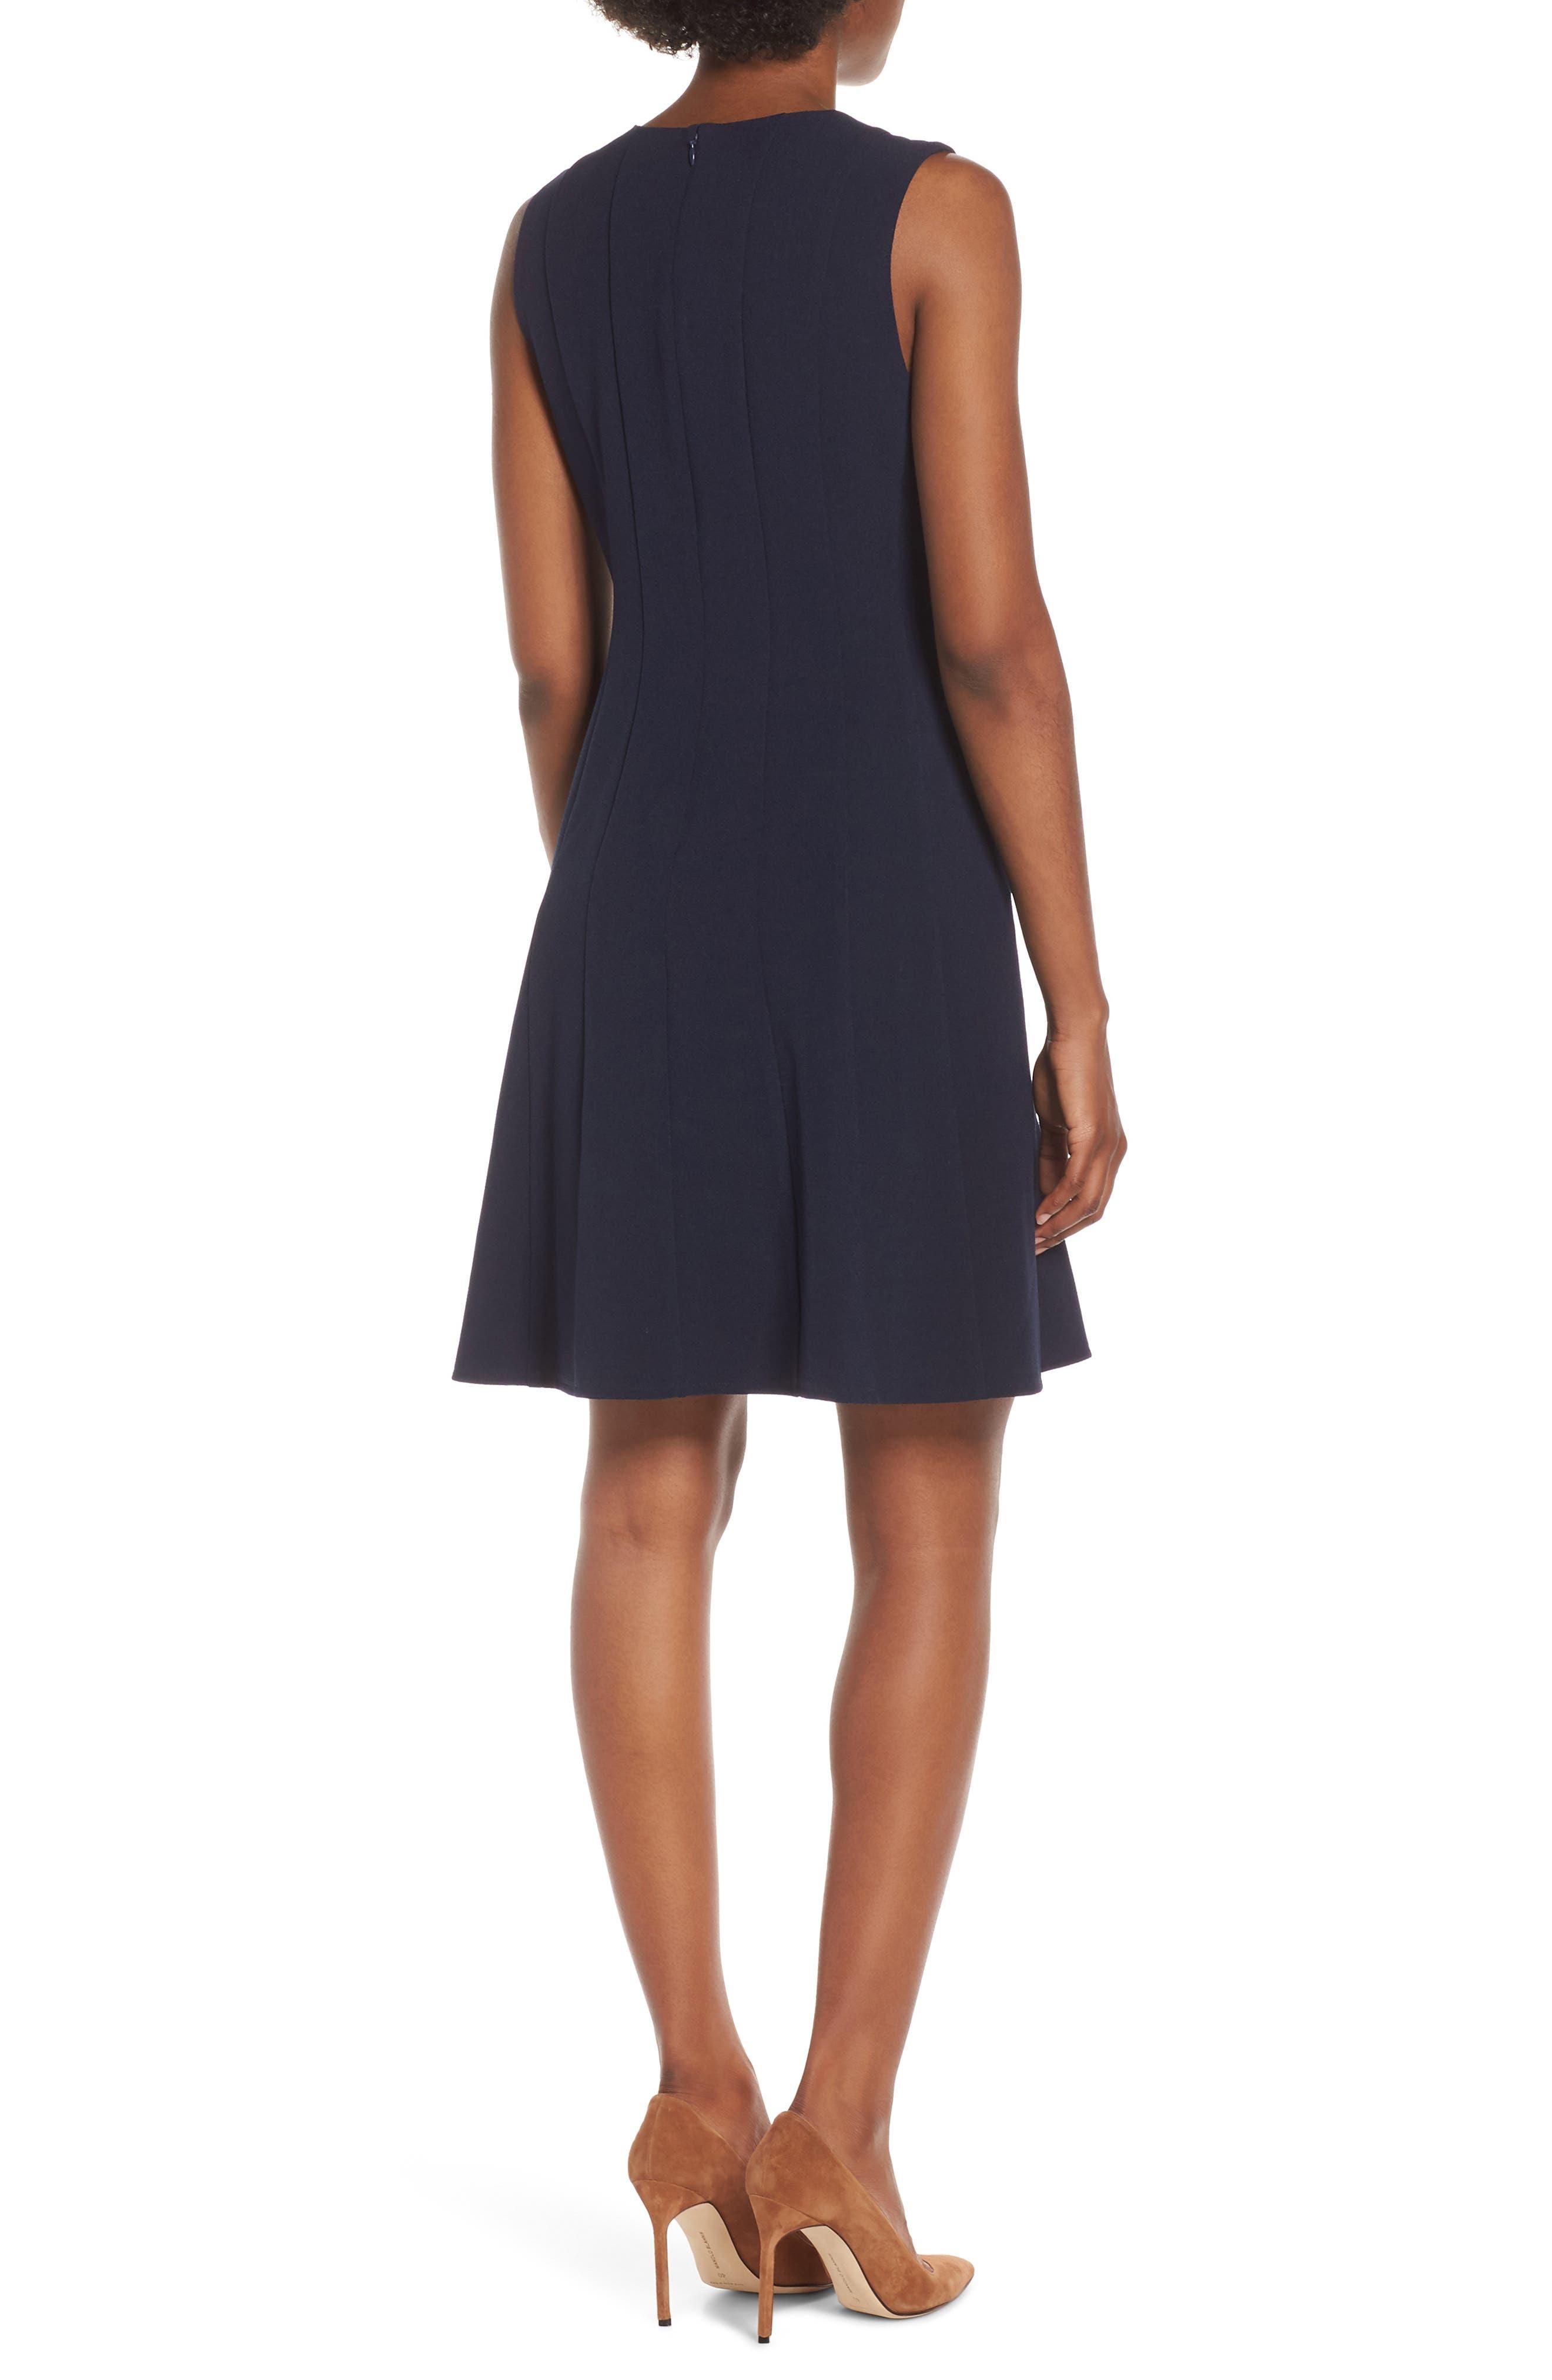 JULIA JORDAN, Sleeveless Pleat Panel Fit & Flare Dress, Alternate thumbnail 2, color, NAVY